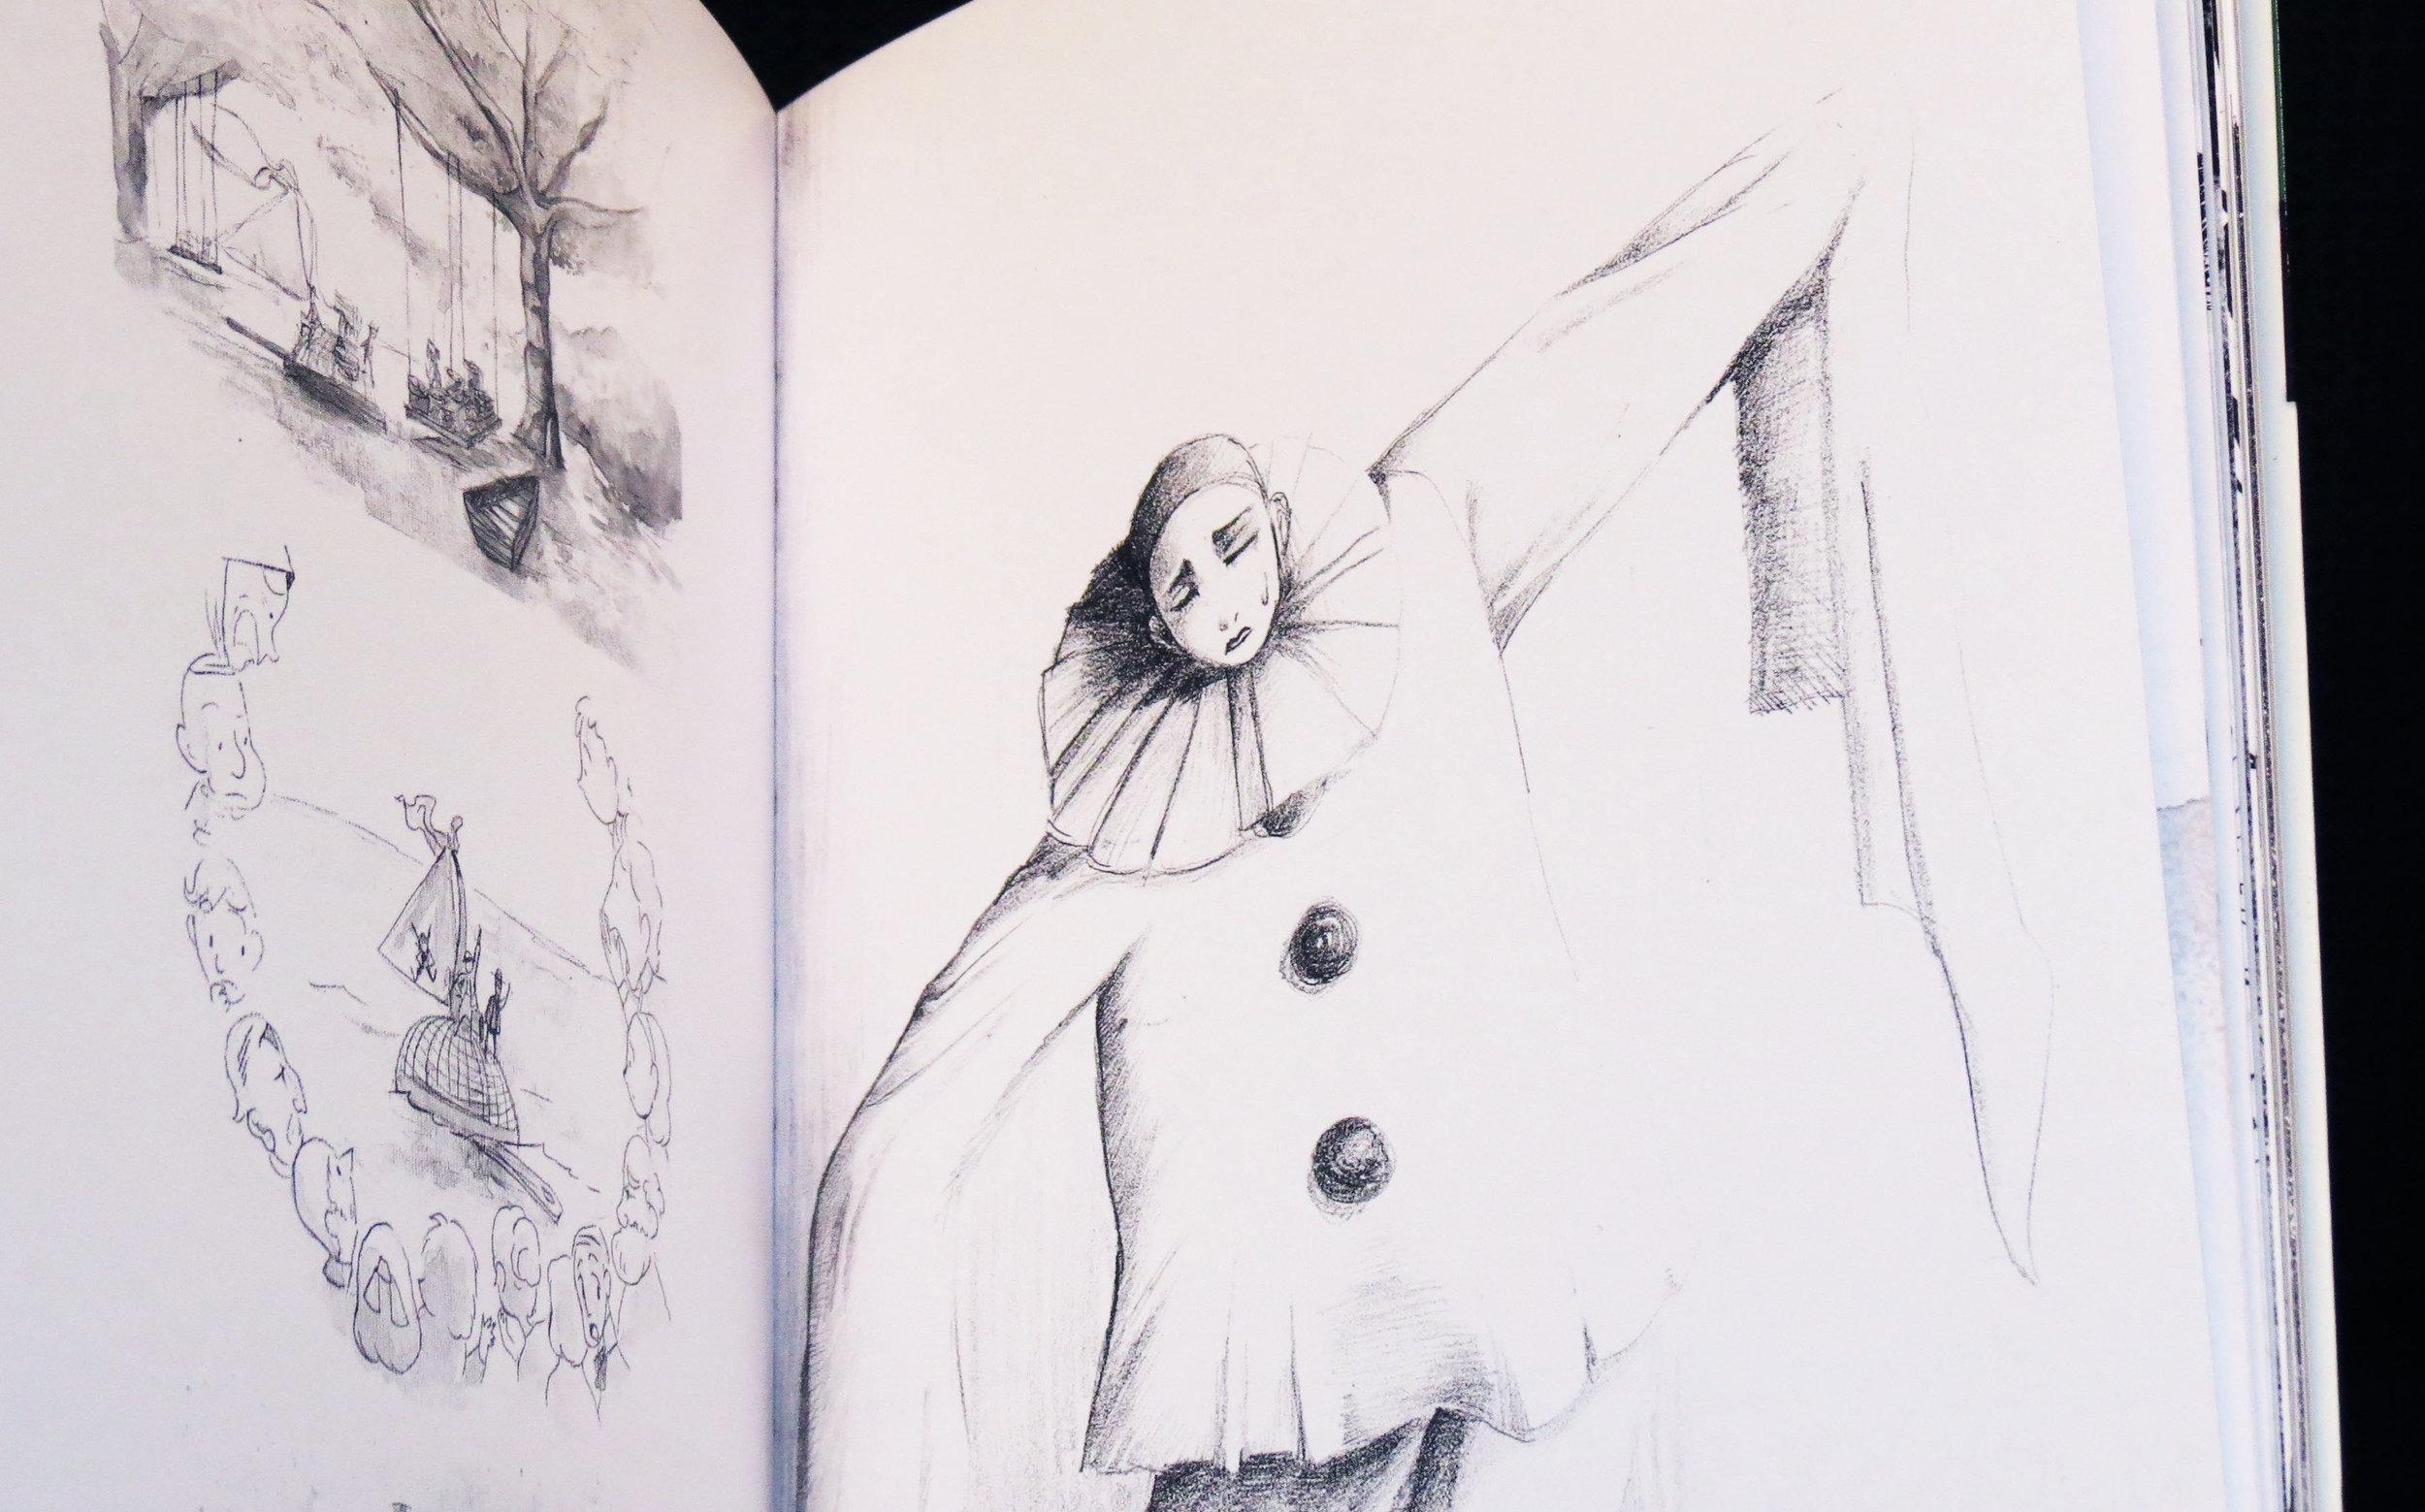 Illustrations by Talessak.